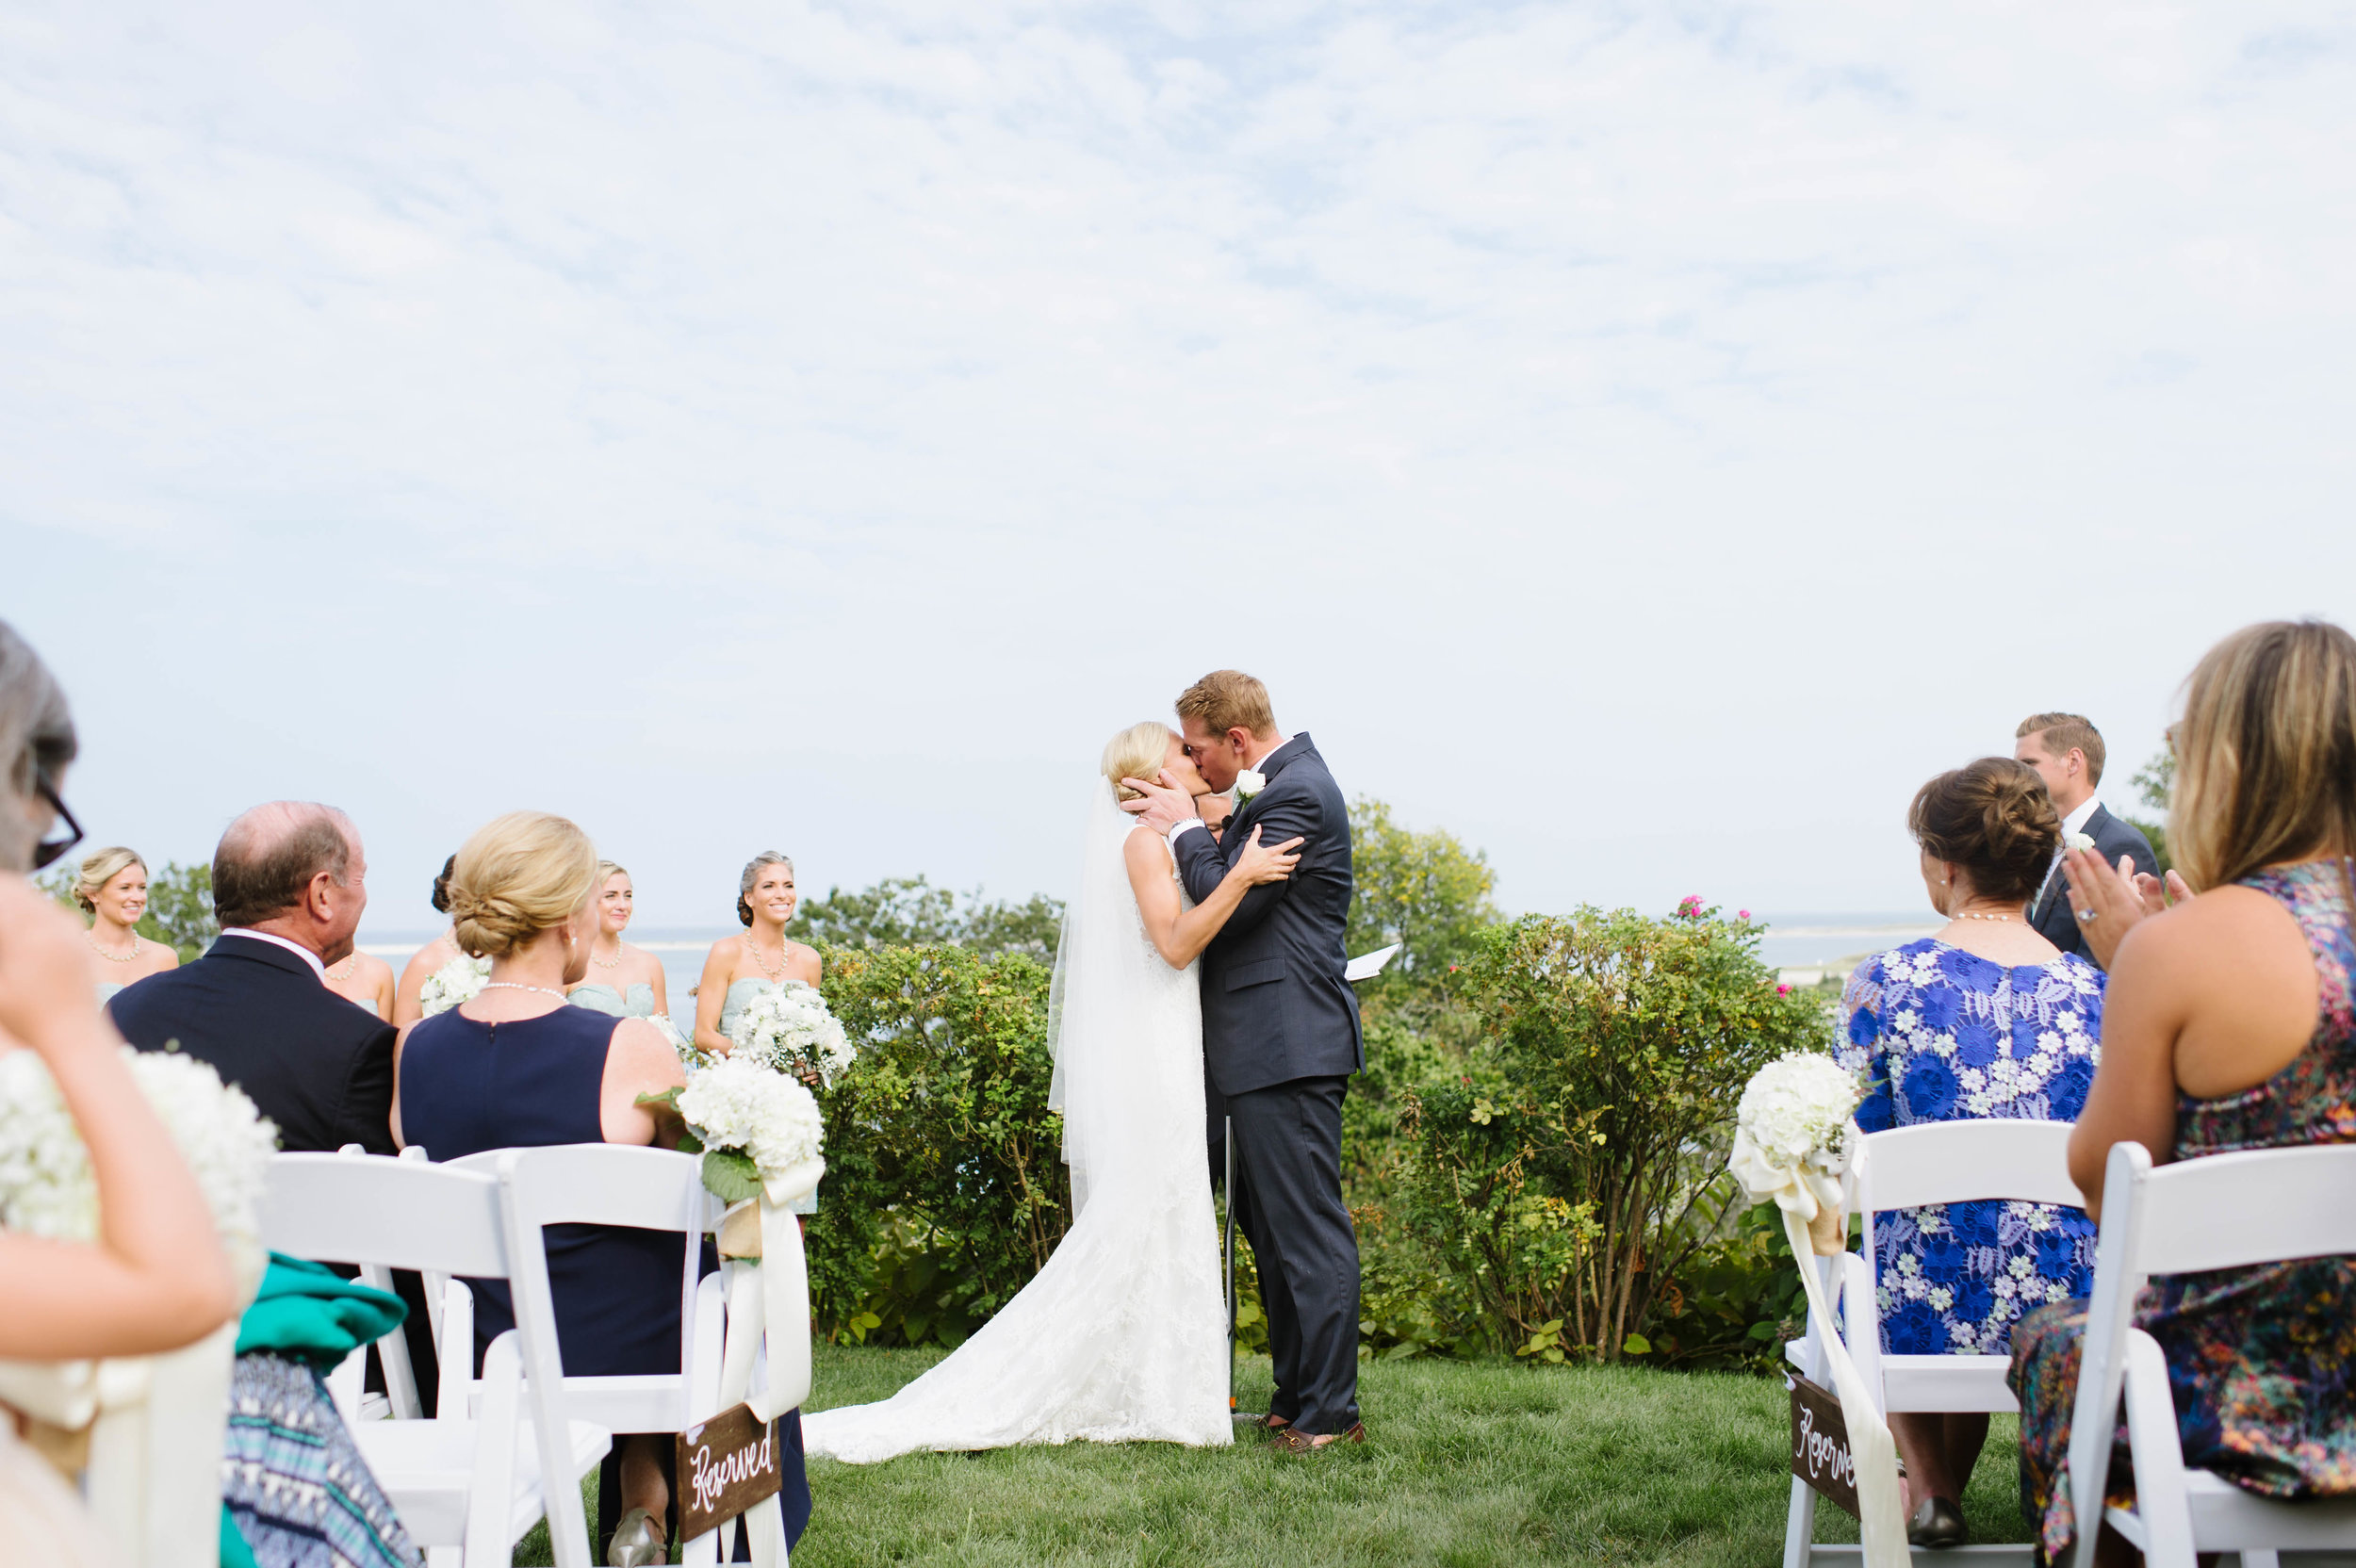 Private-Home-Wedding032.jpg